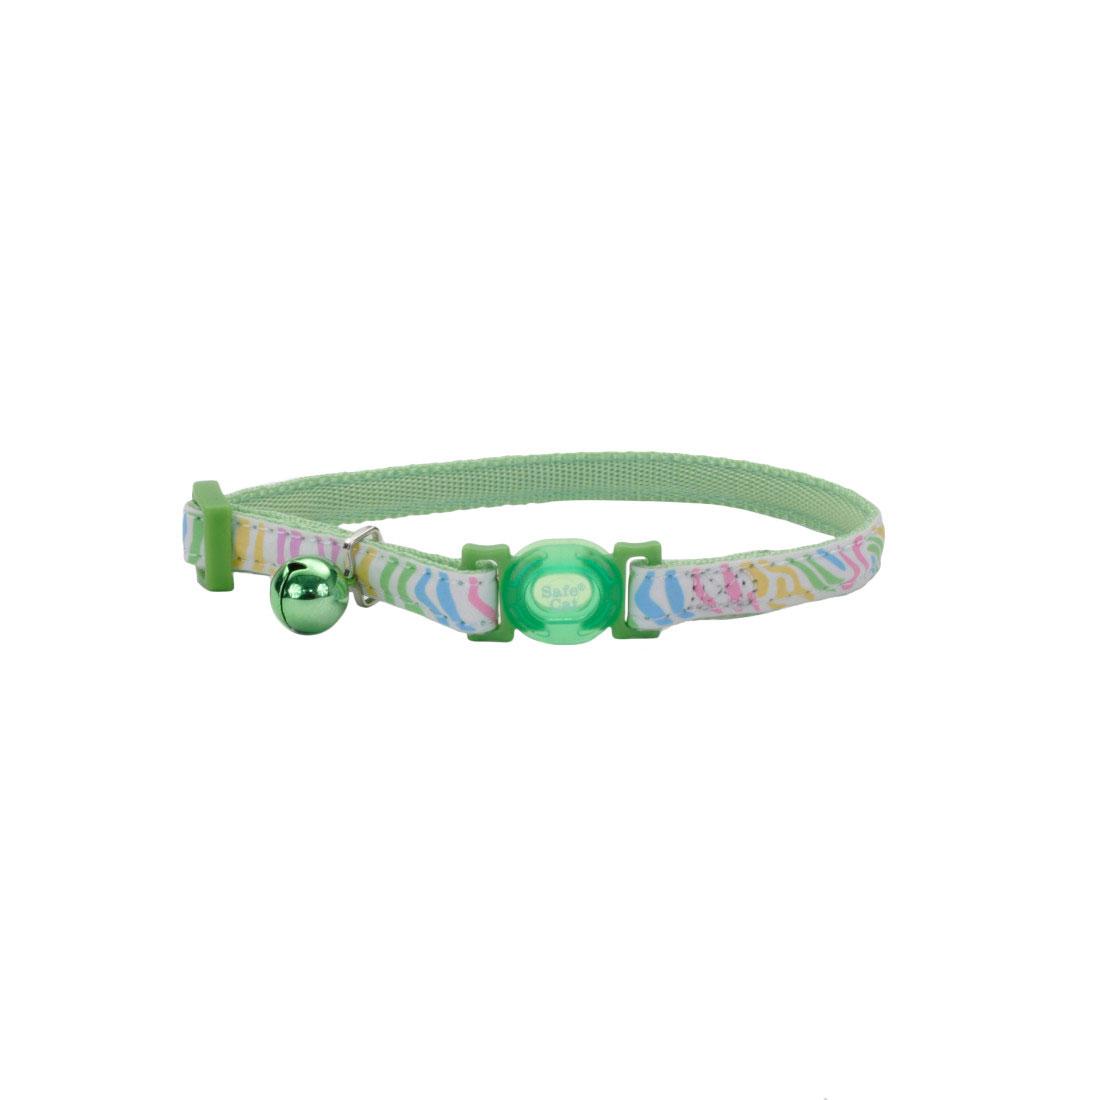 Safe Cat Glow in the Dark Adjustable Breakaway Collar, Glowing Green Stripes, 3/8-in x 8-in-12-in